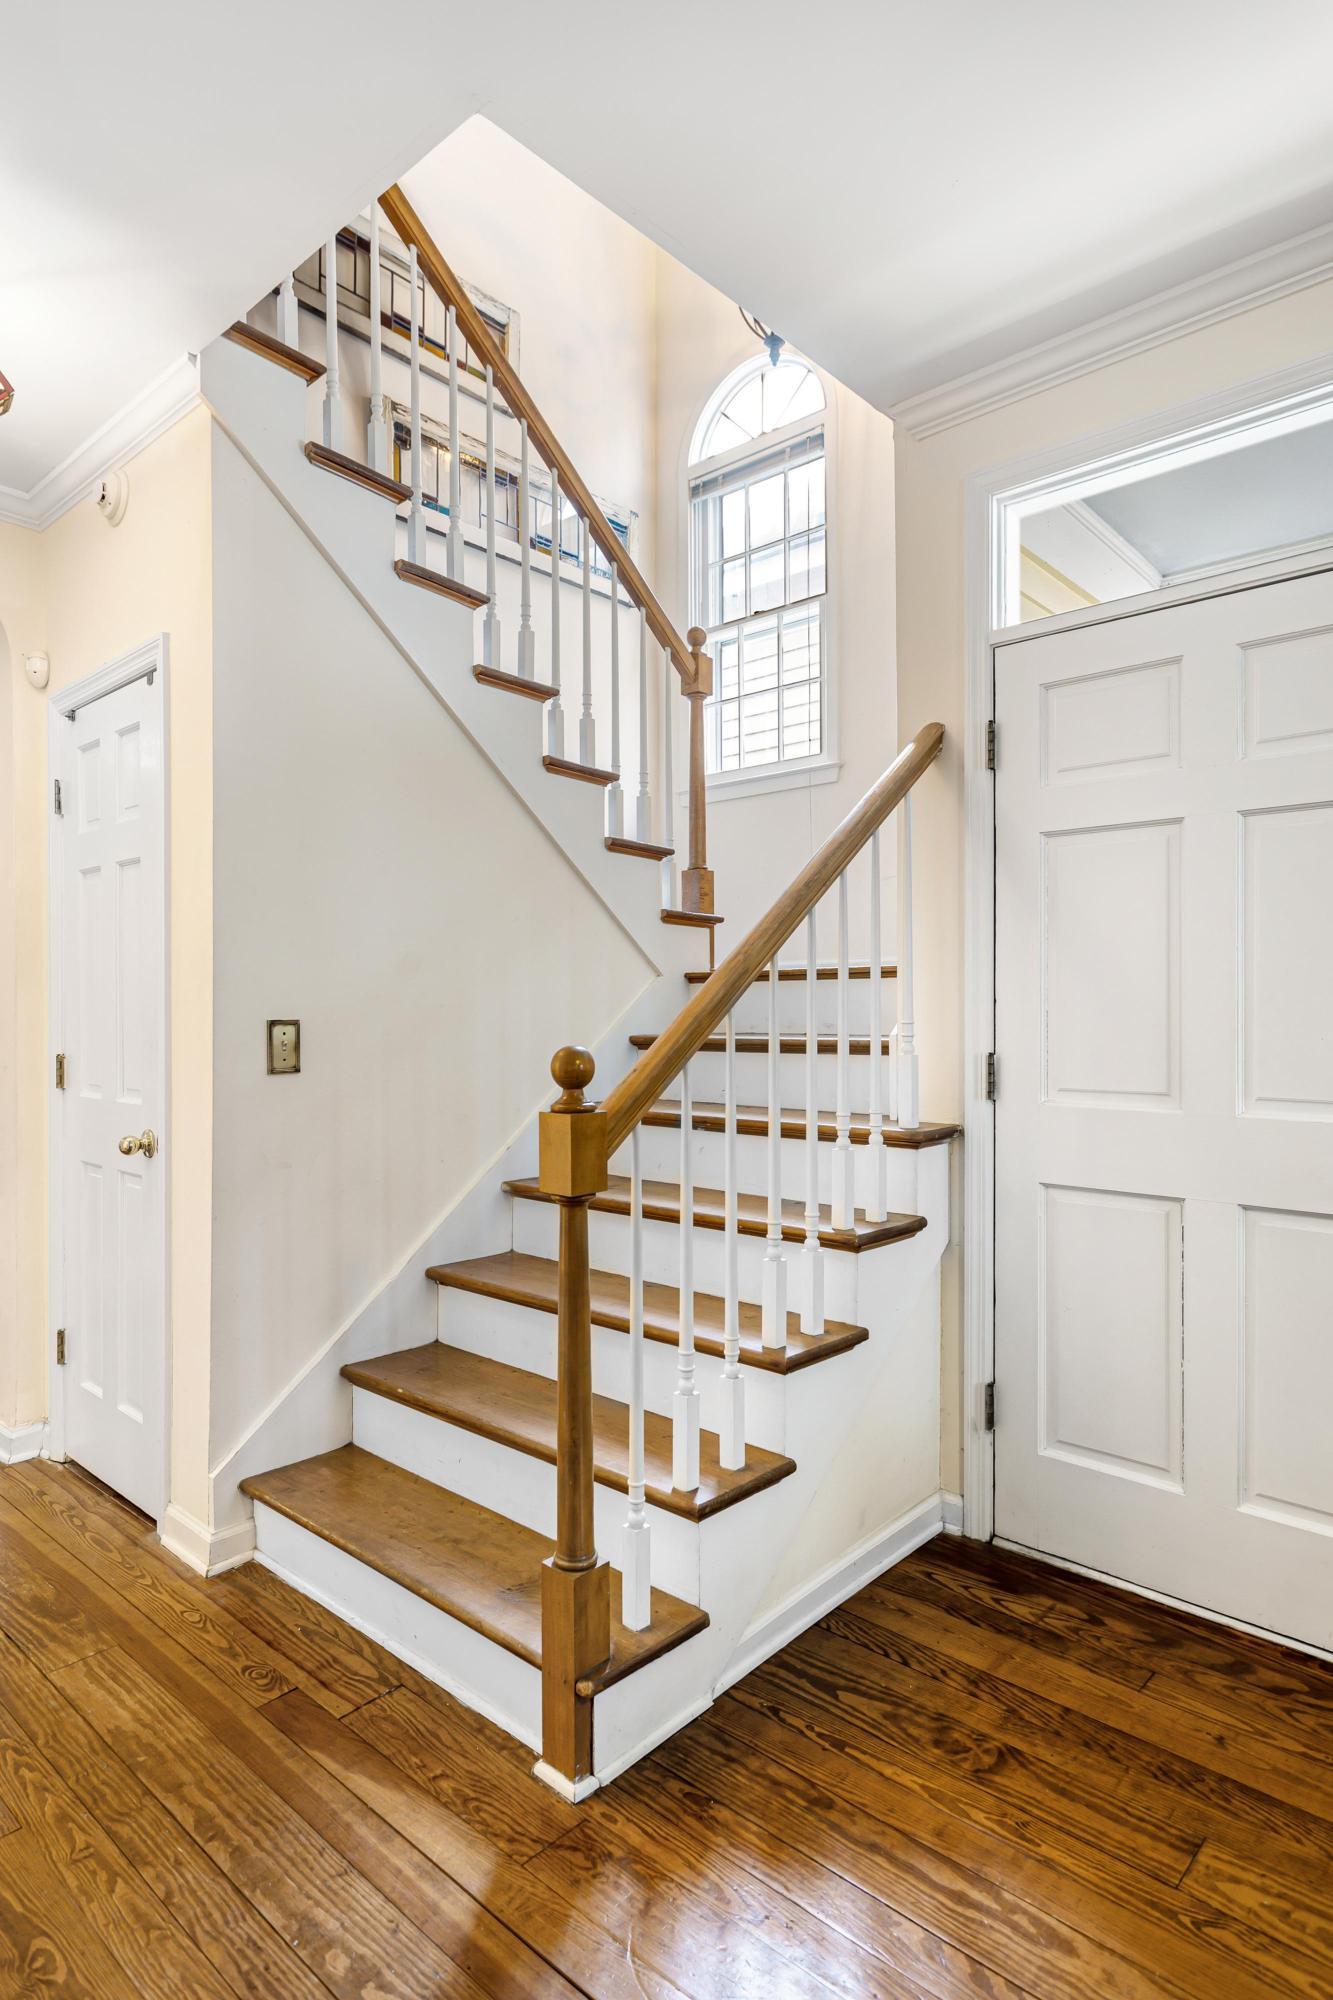 Radcliffeborough Homes For Sale - 108 Smith, Charleston, SC - 11